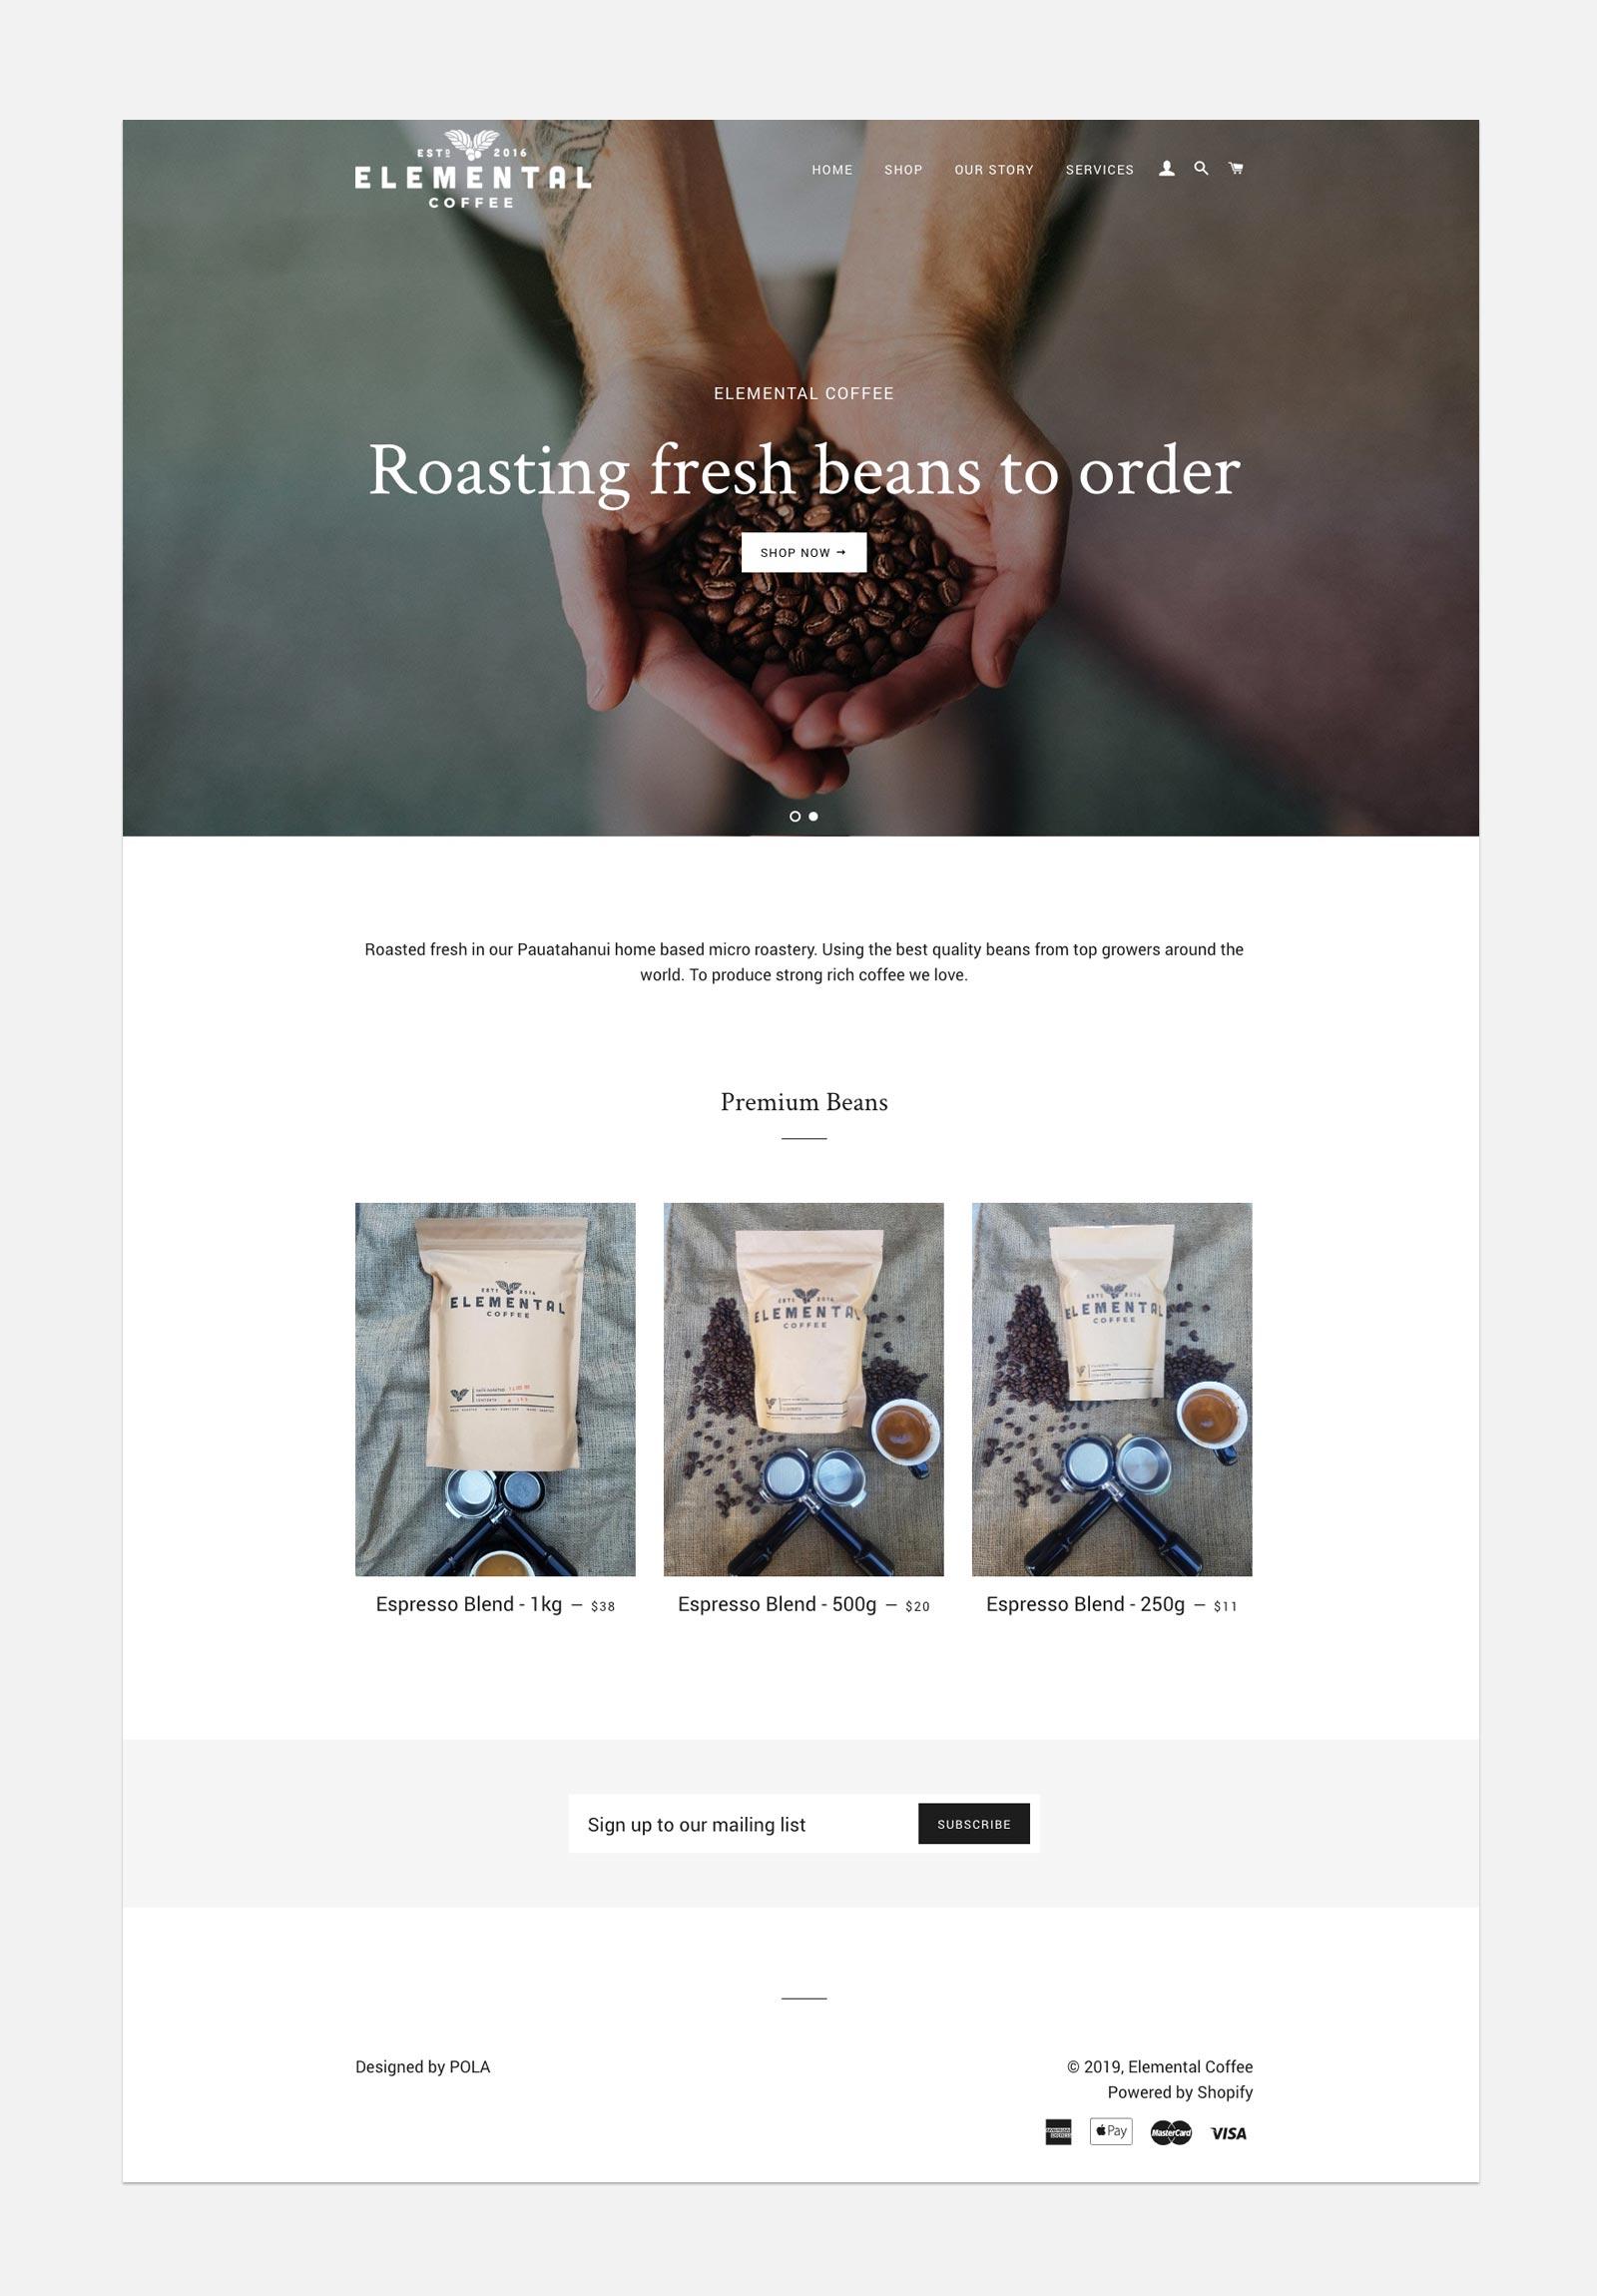 Elemental Coffee   Home page desktop view